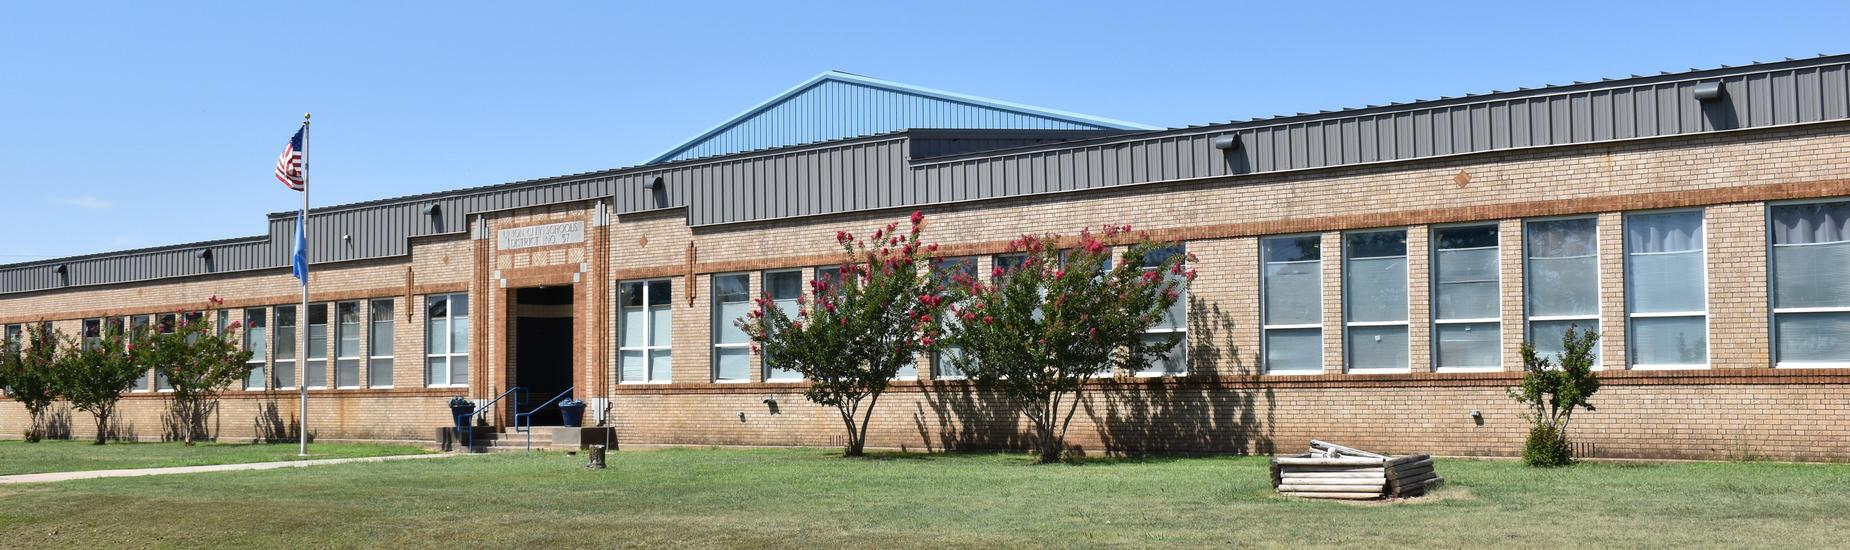 Union City Public Schools